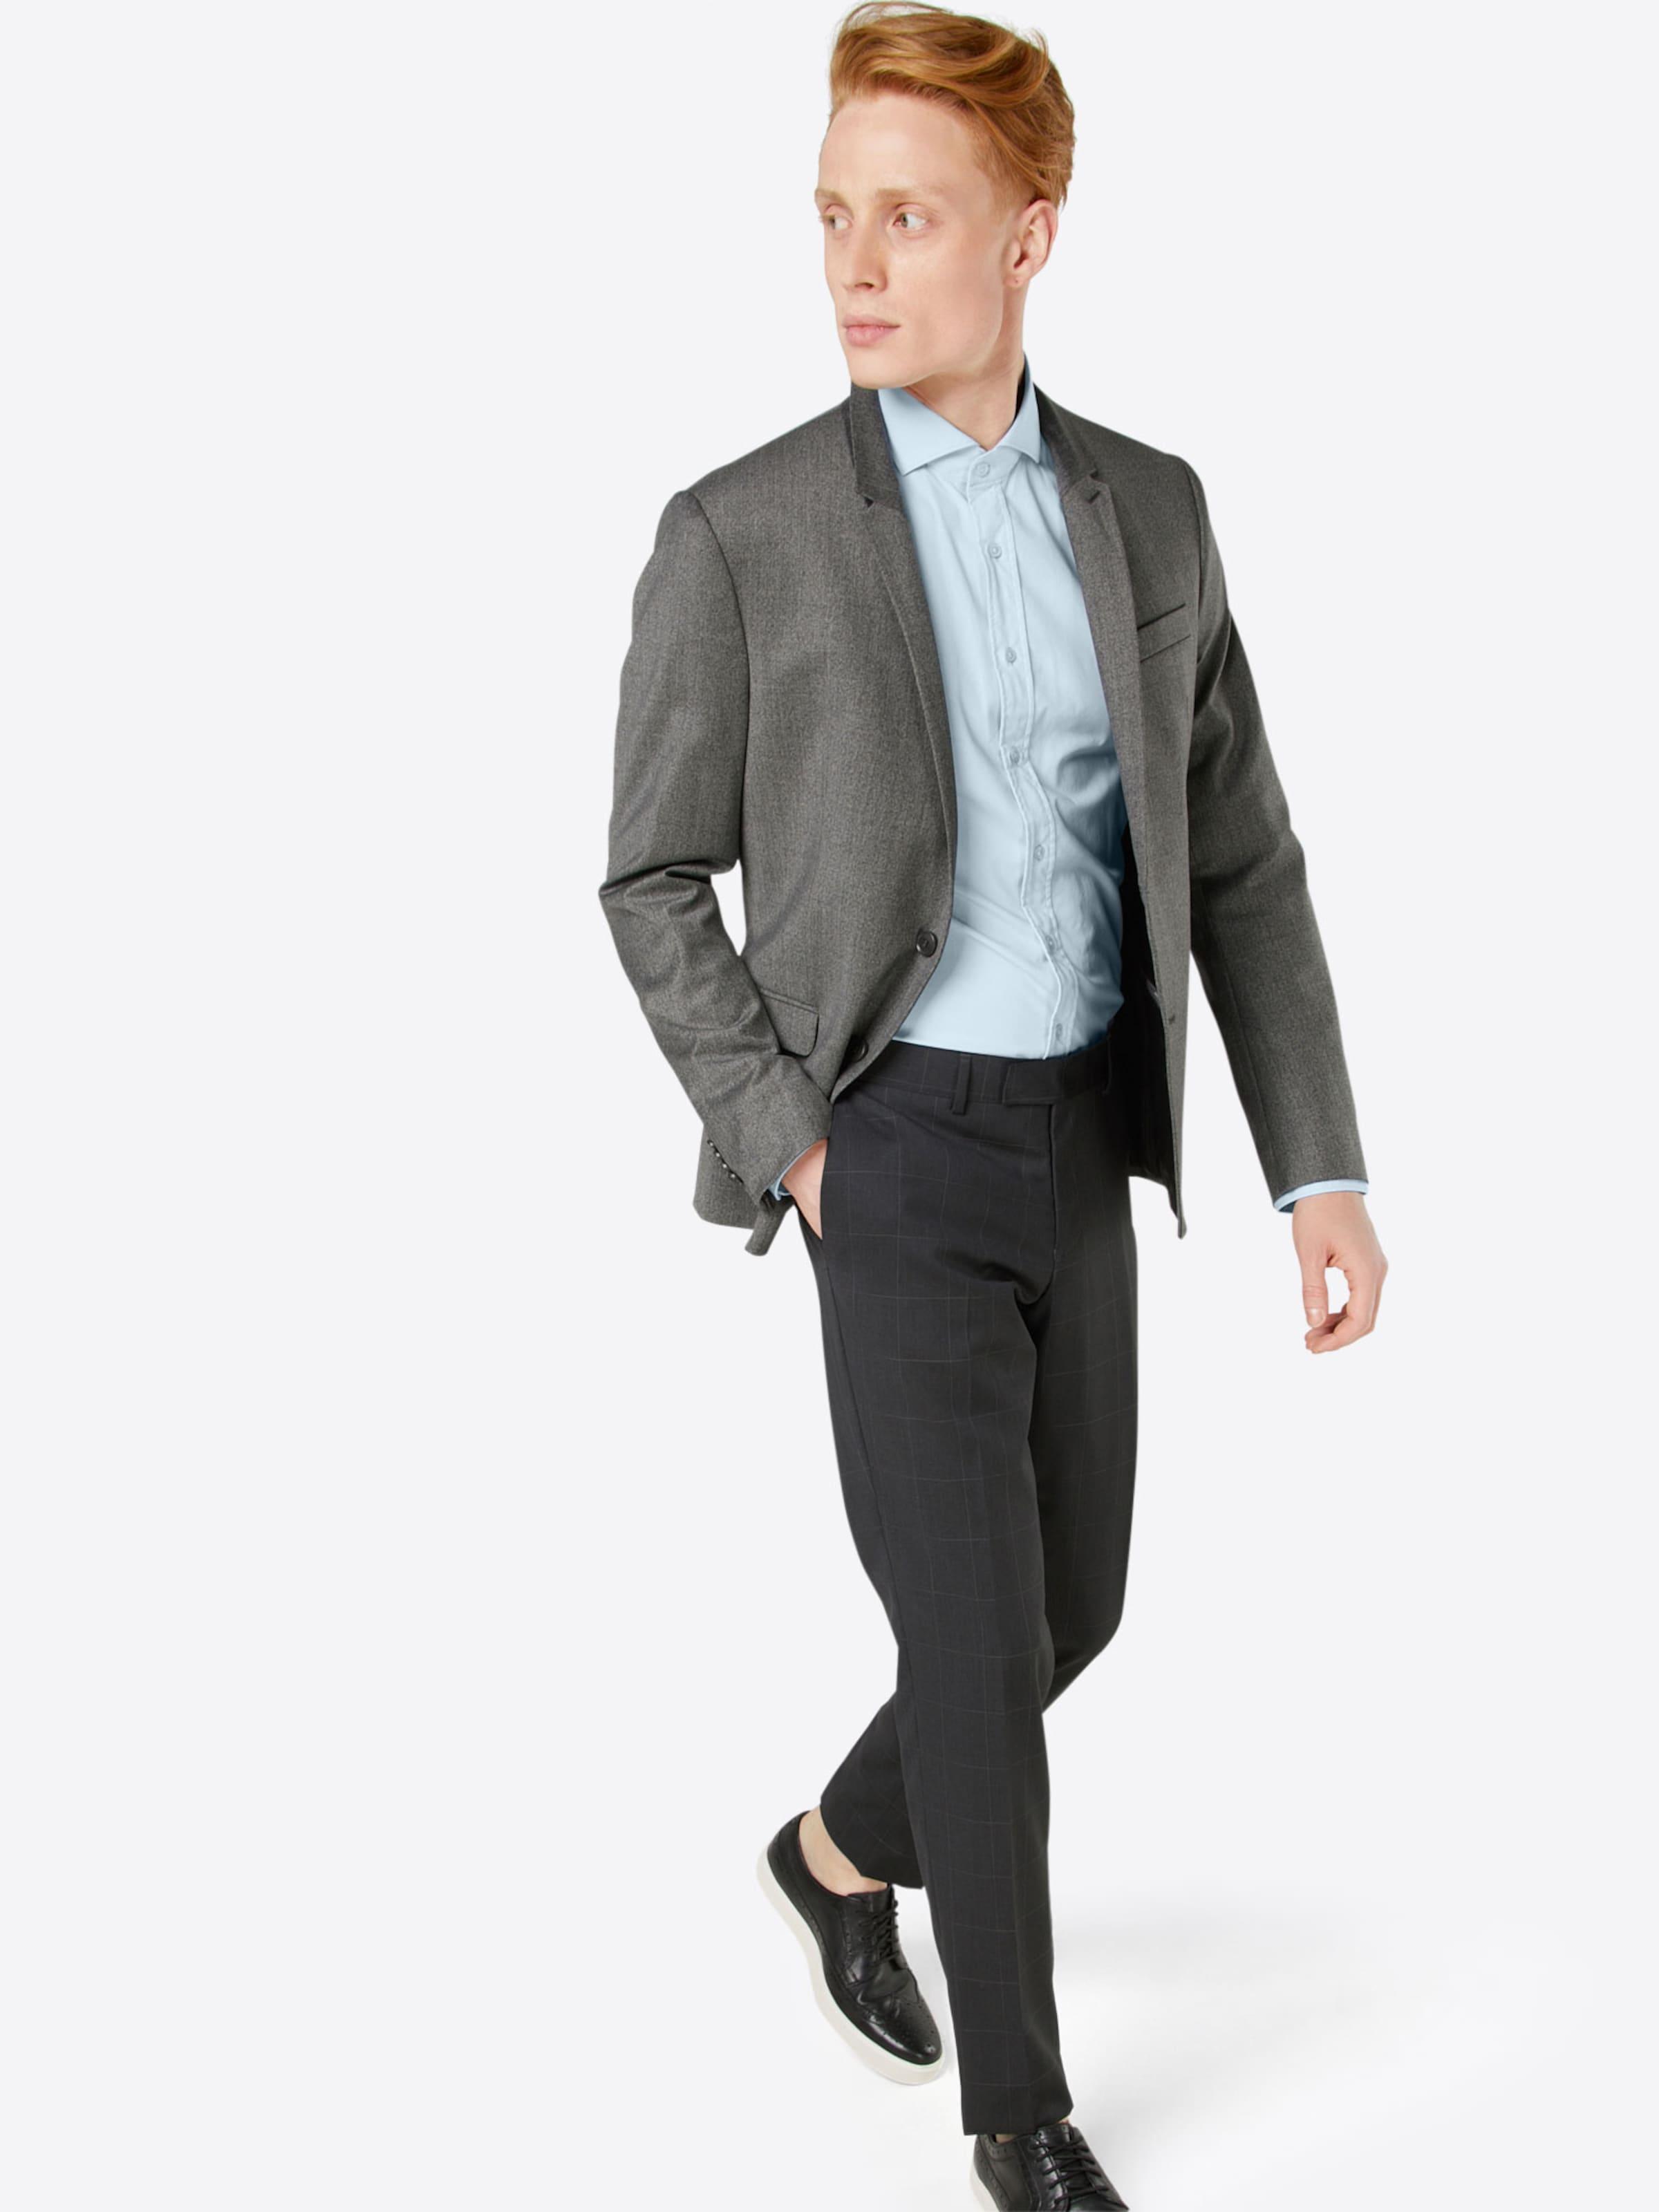 Marc O'Polo Business Hemden Verkauf Billig 7lNjkdf